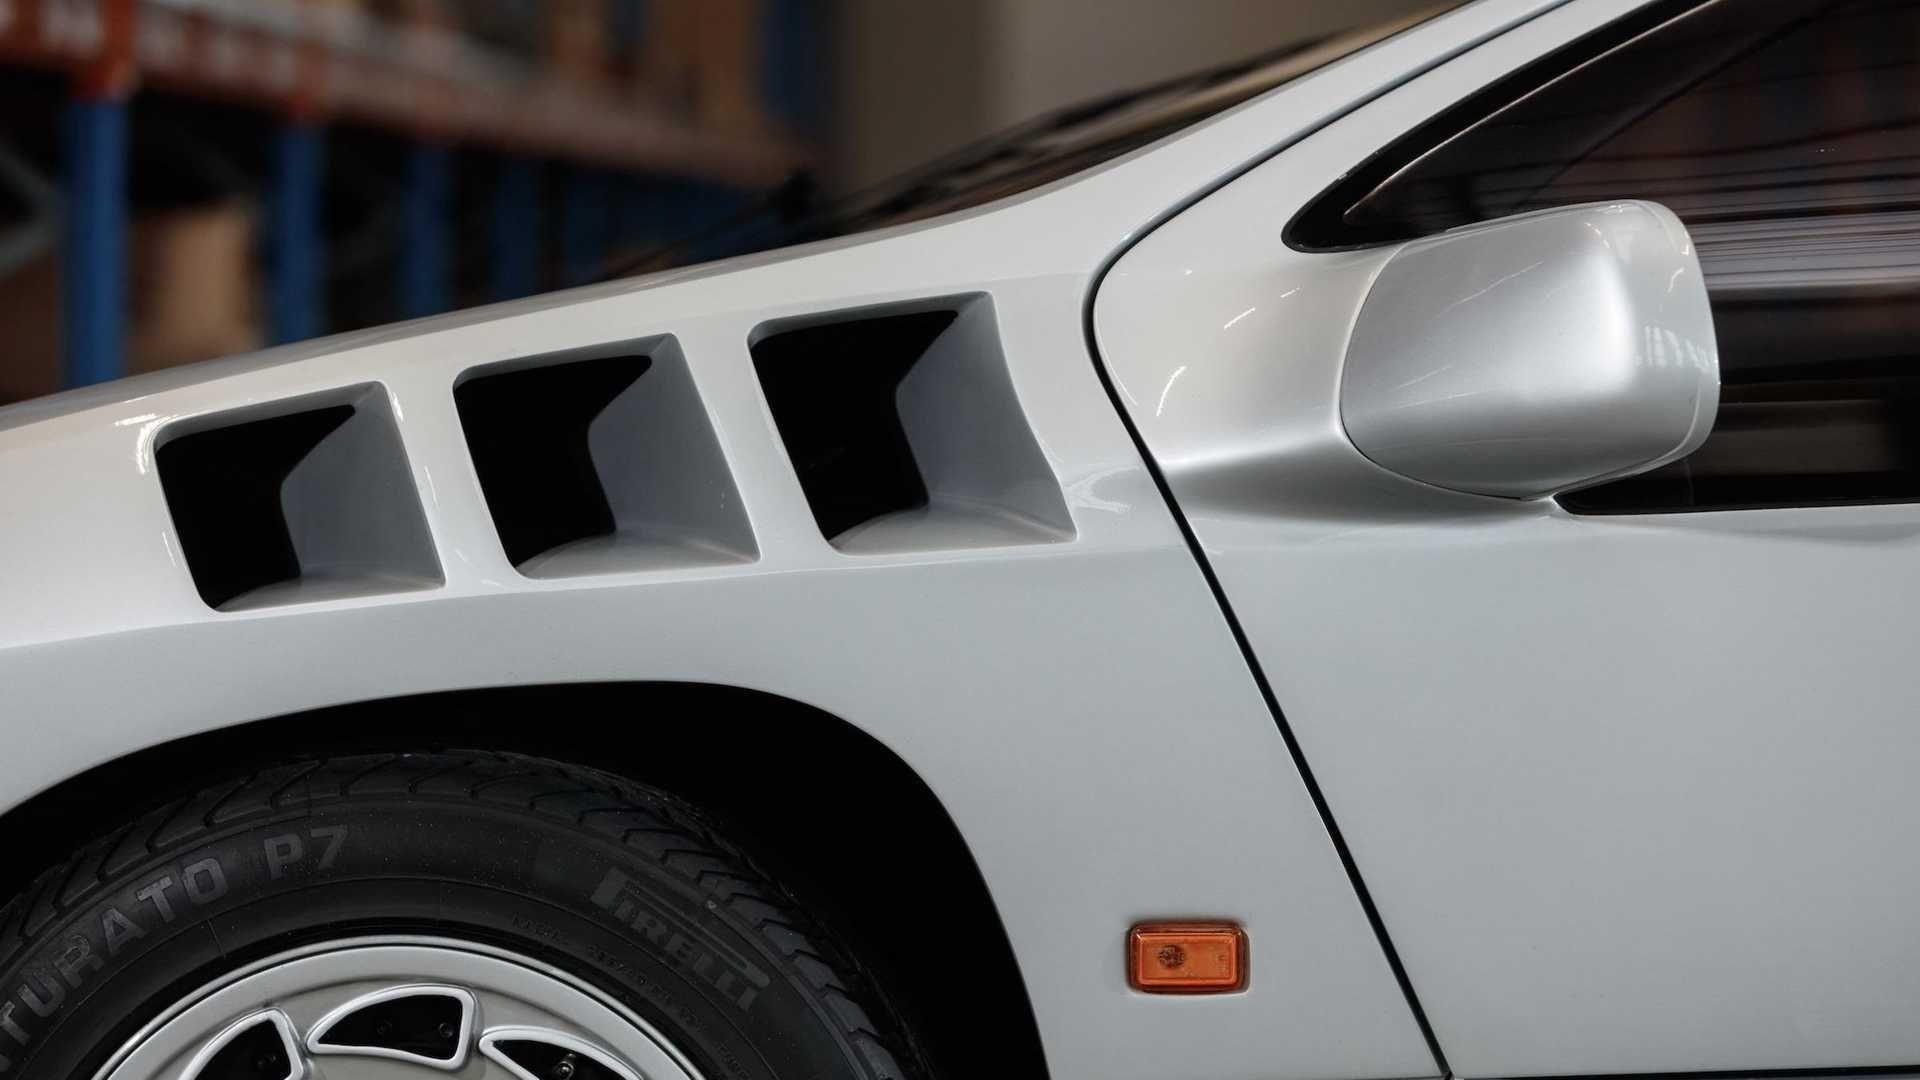 Редкий суперкар Isdera Imperator 108i с двигателем Mercedes